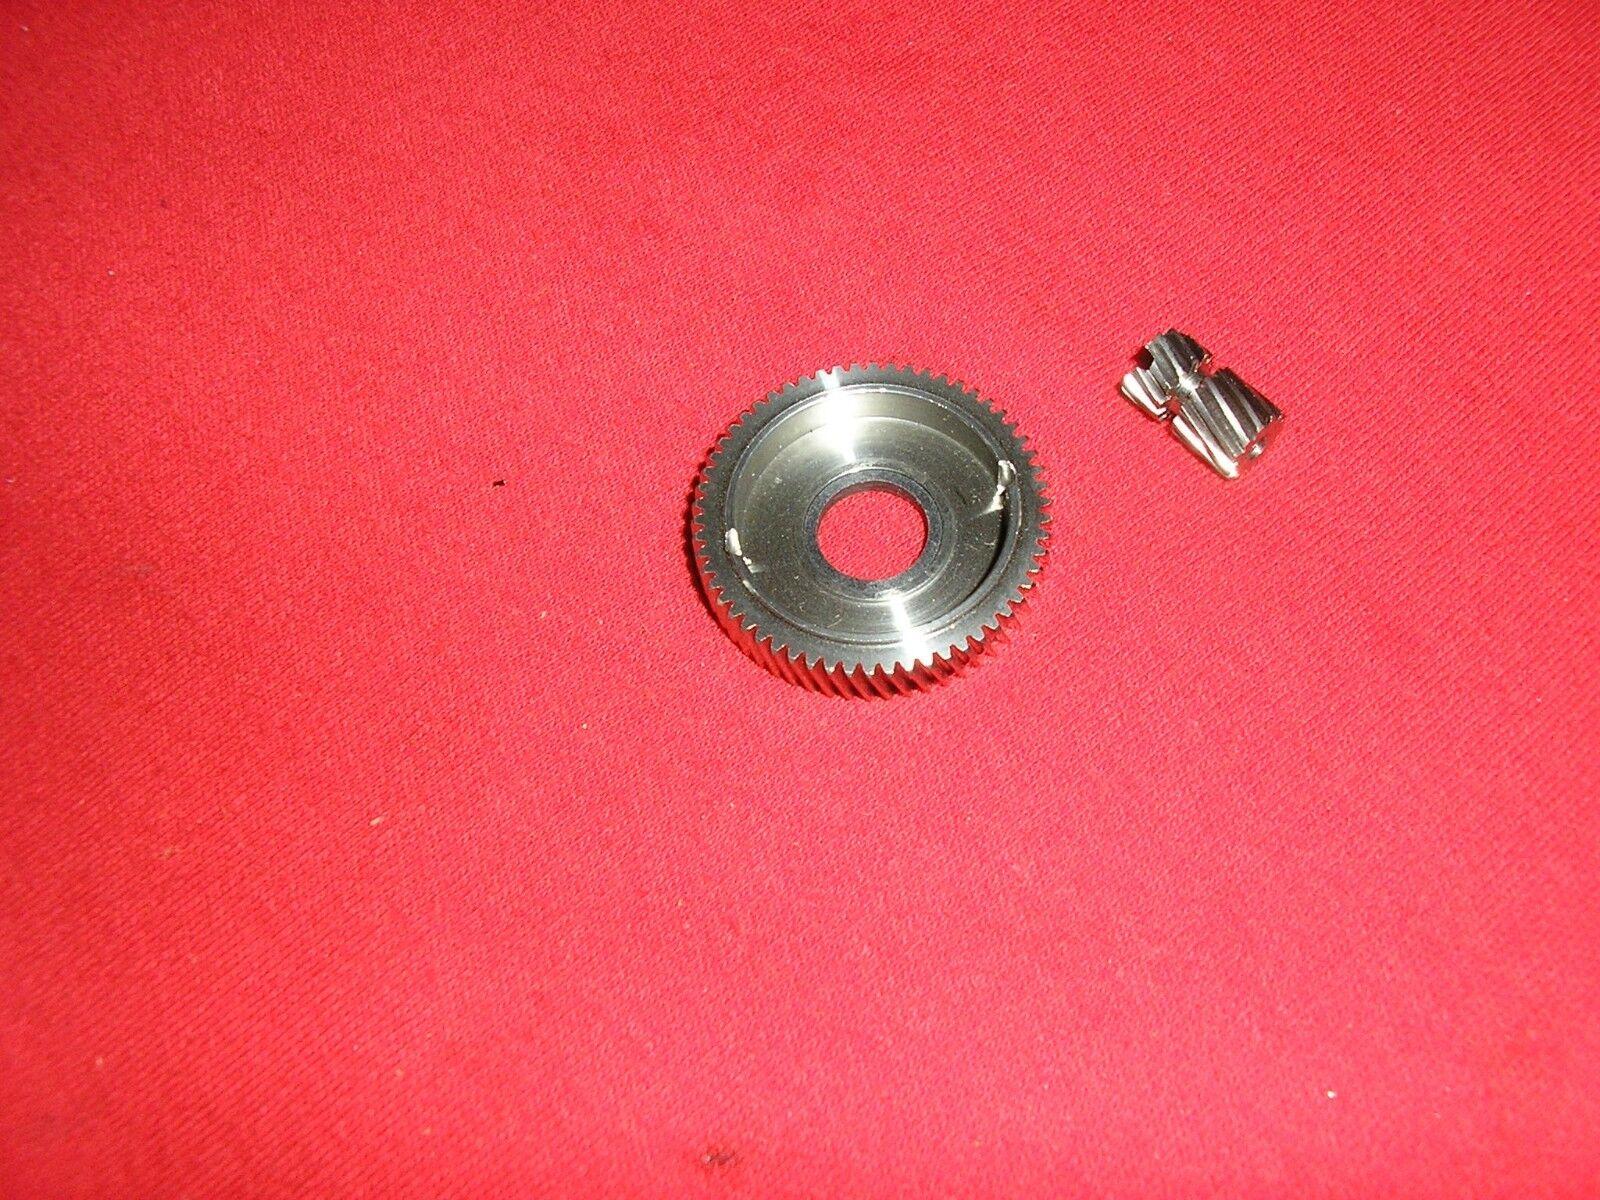 Penn reel repair parts  & service (drive & pinion  gear set)  free shipping worldwide